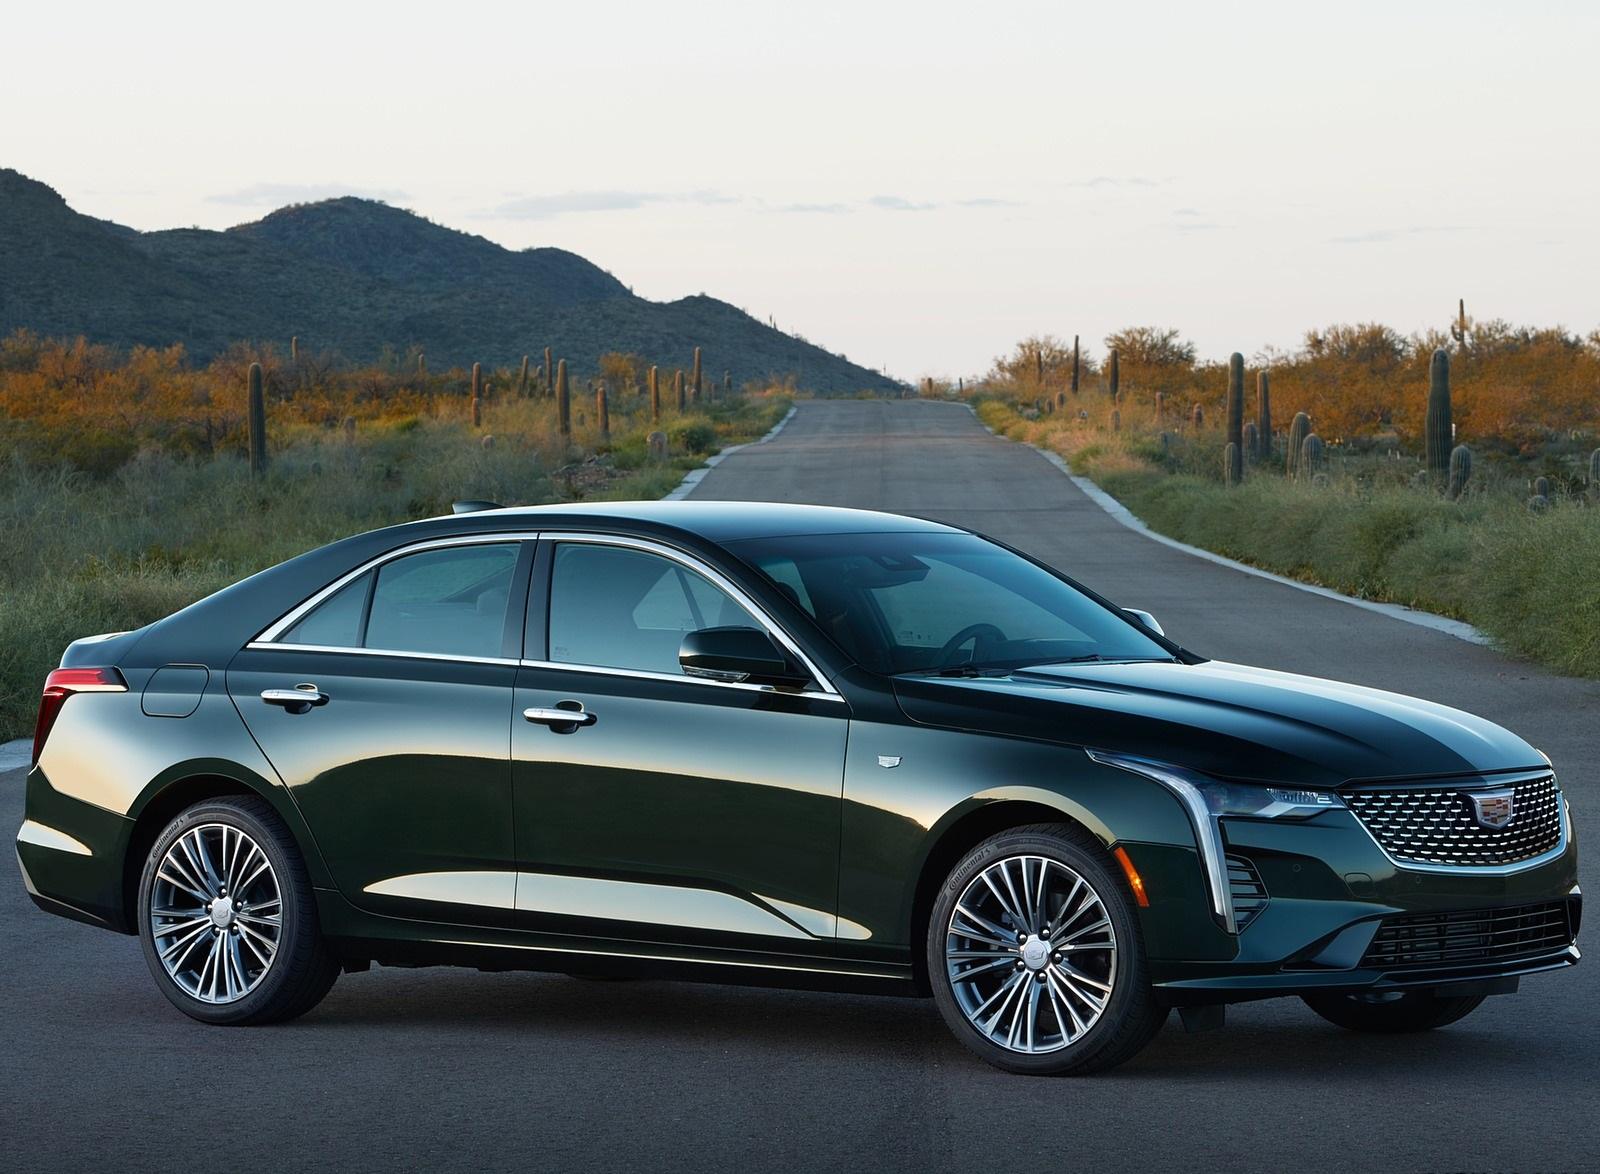 2020 Cadillac CT4 Premium Luxury Front Three-Quarter Wallpapers (8)